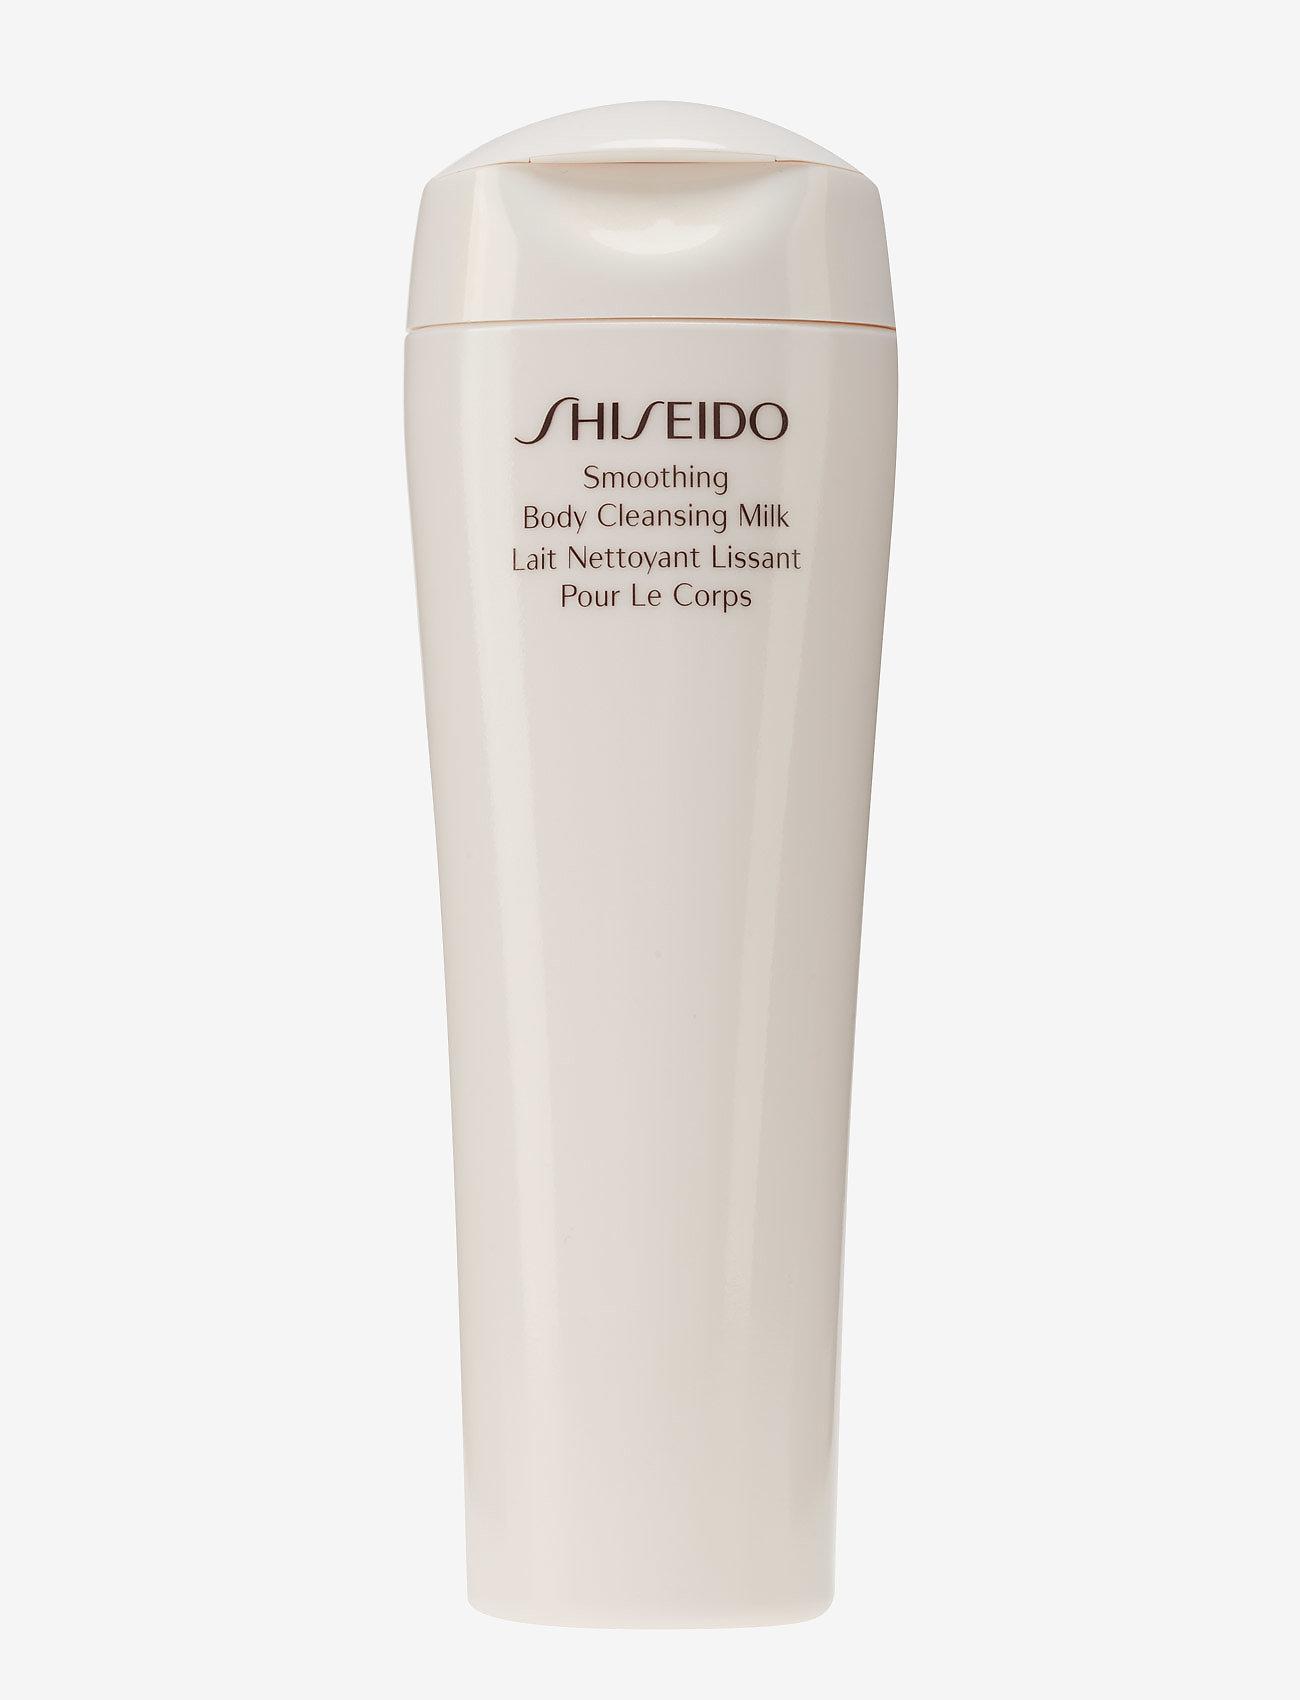 Shiseido - BODYCARE SMOOTHING BODY CLEANSING MILK - vartalovoide - no color - 0